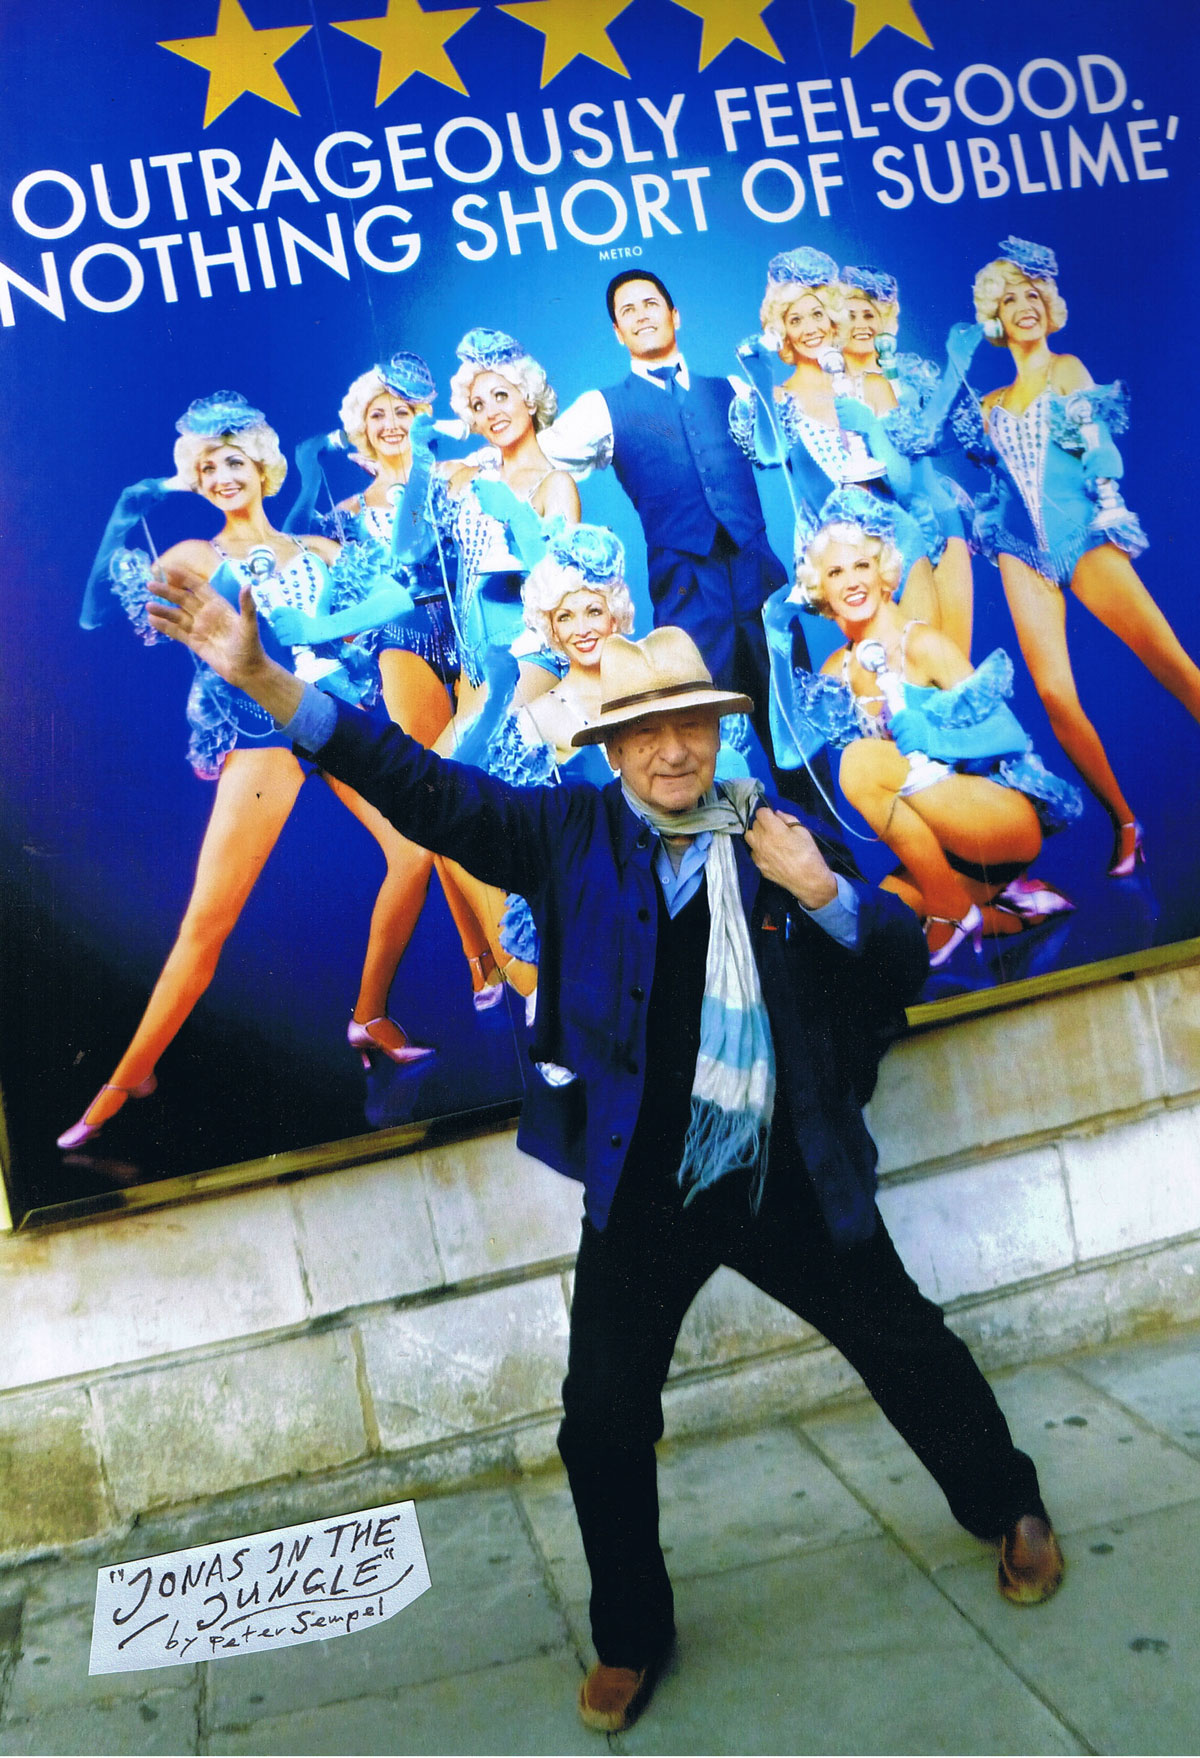 Jonas Mekas, London | courtesy Peter Sempel